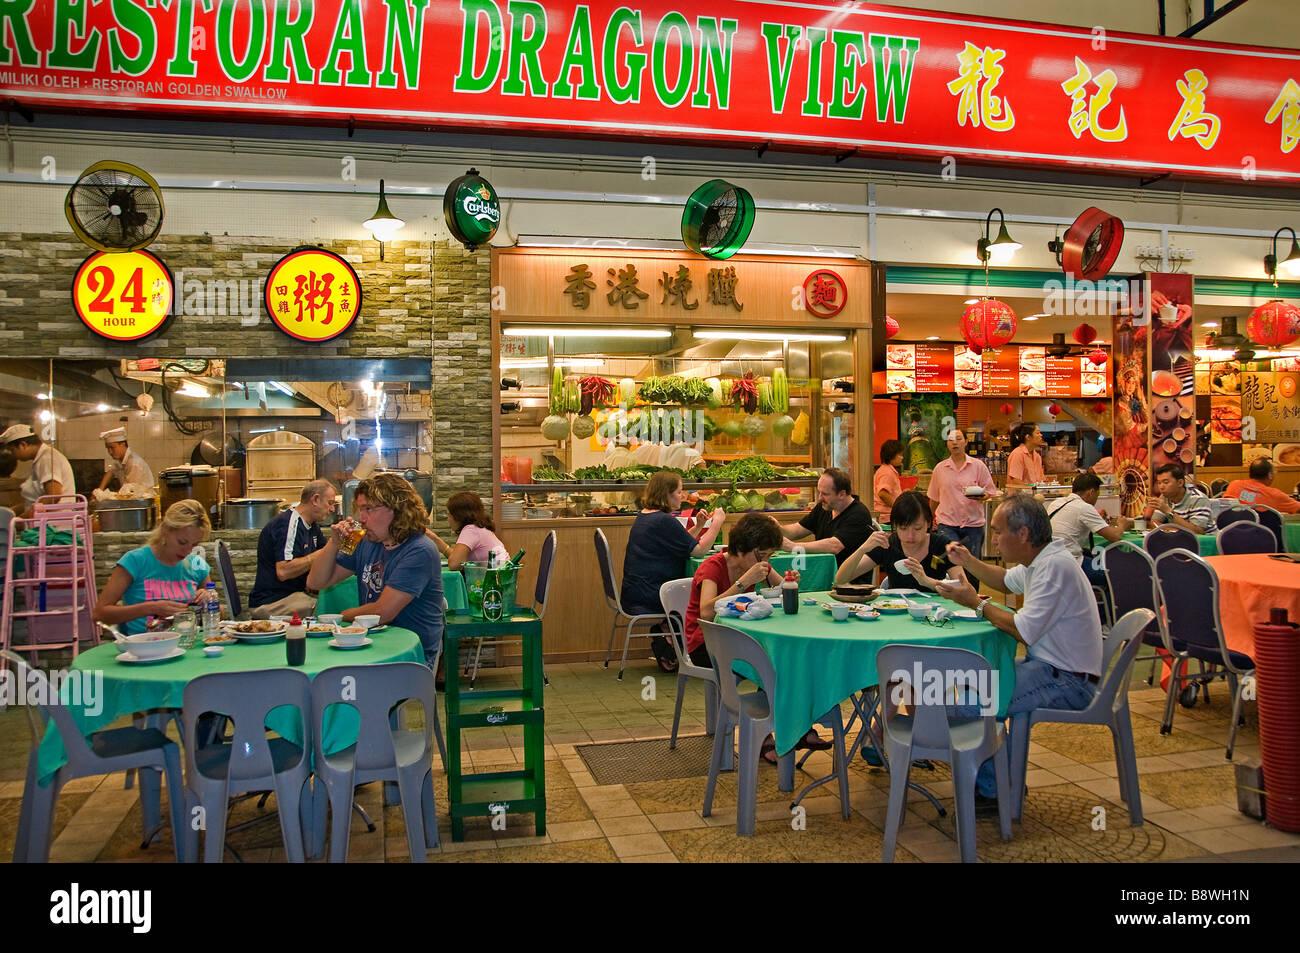 Malaysia kuala lumpur bukit bintang kitchen open air for Asian cuisine indian and thai food page